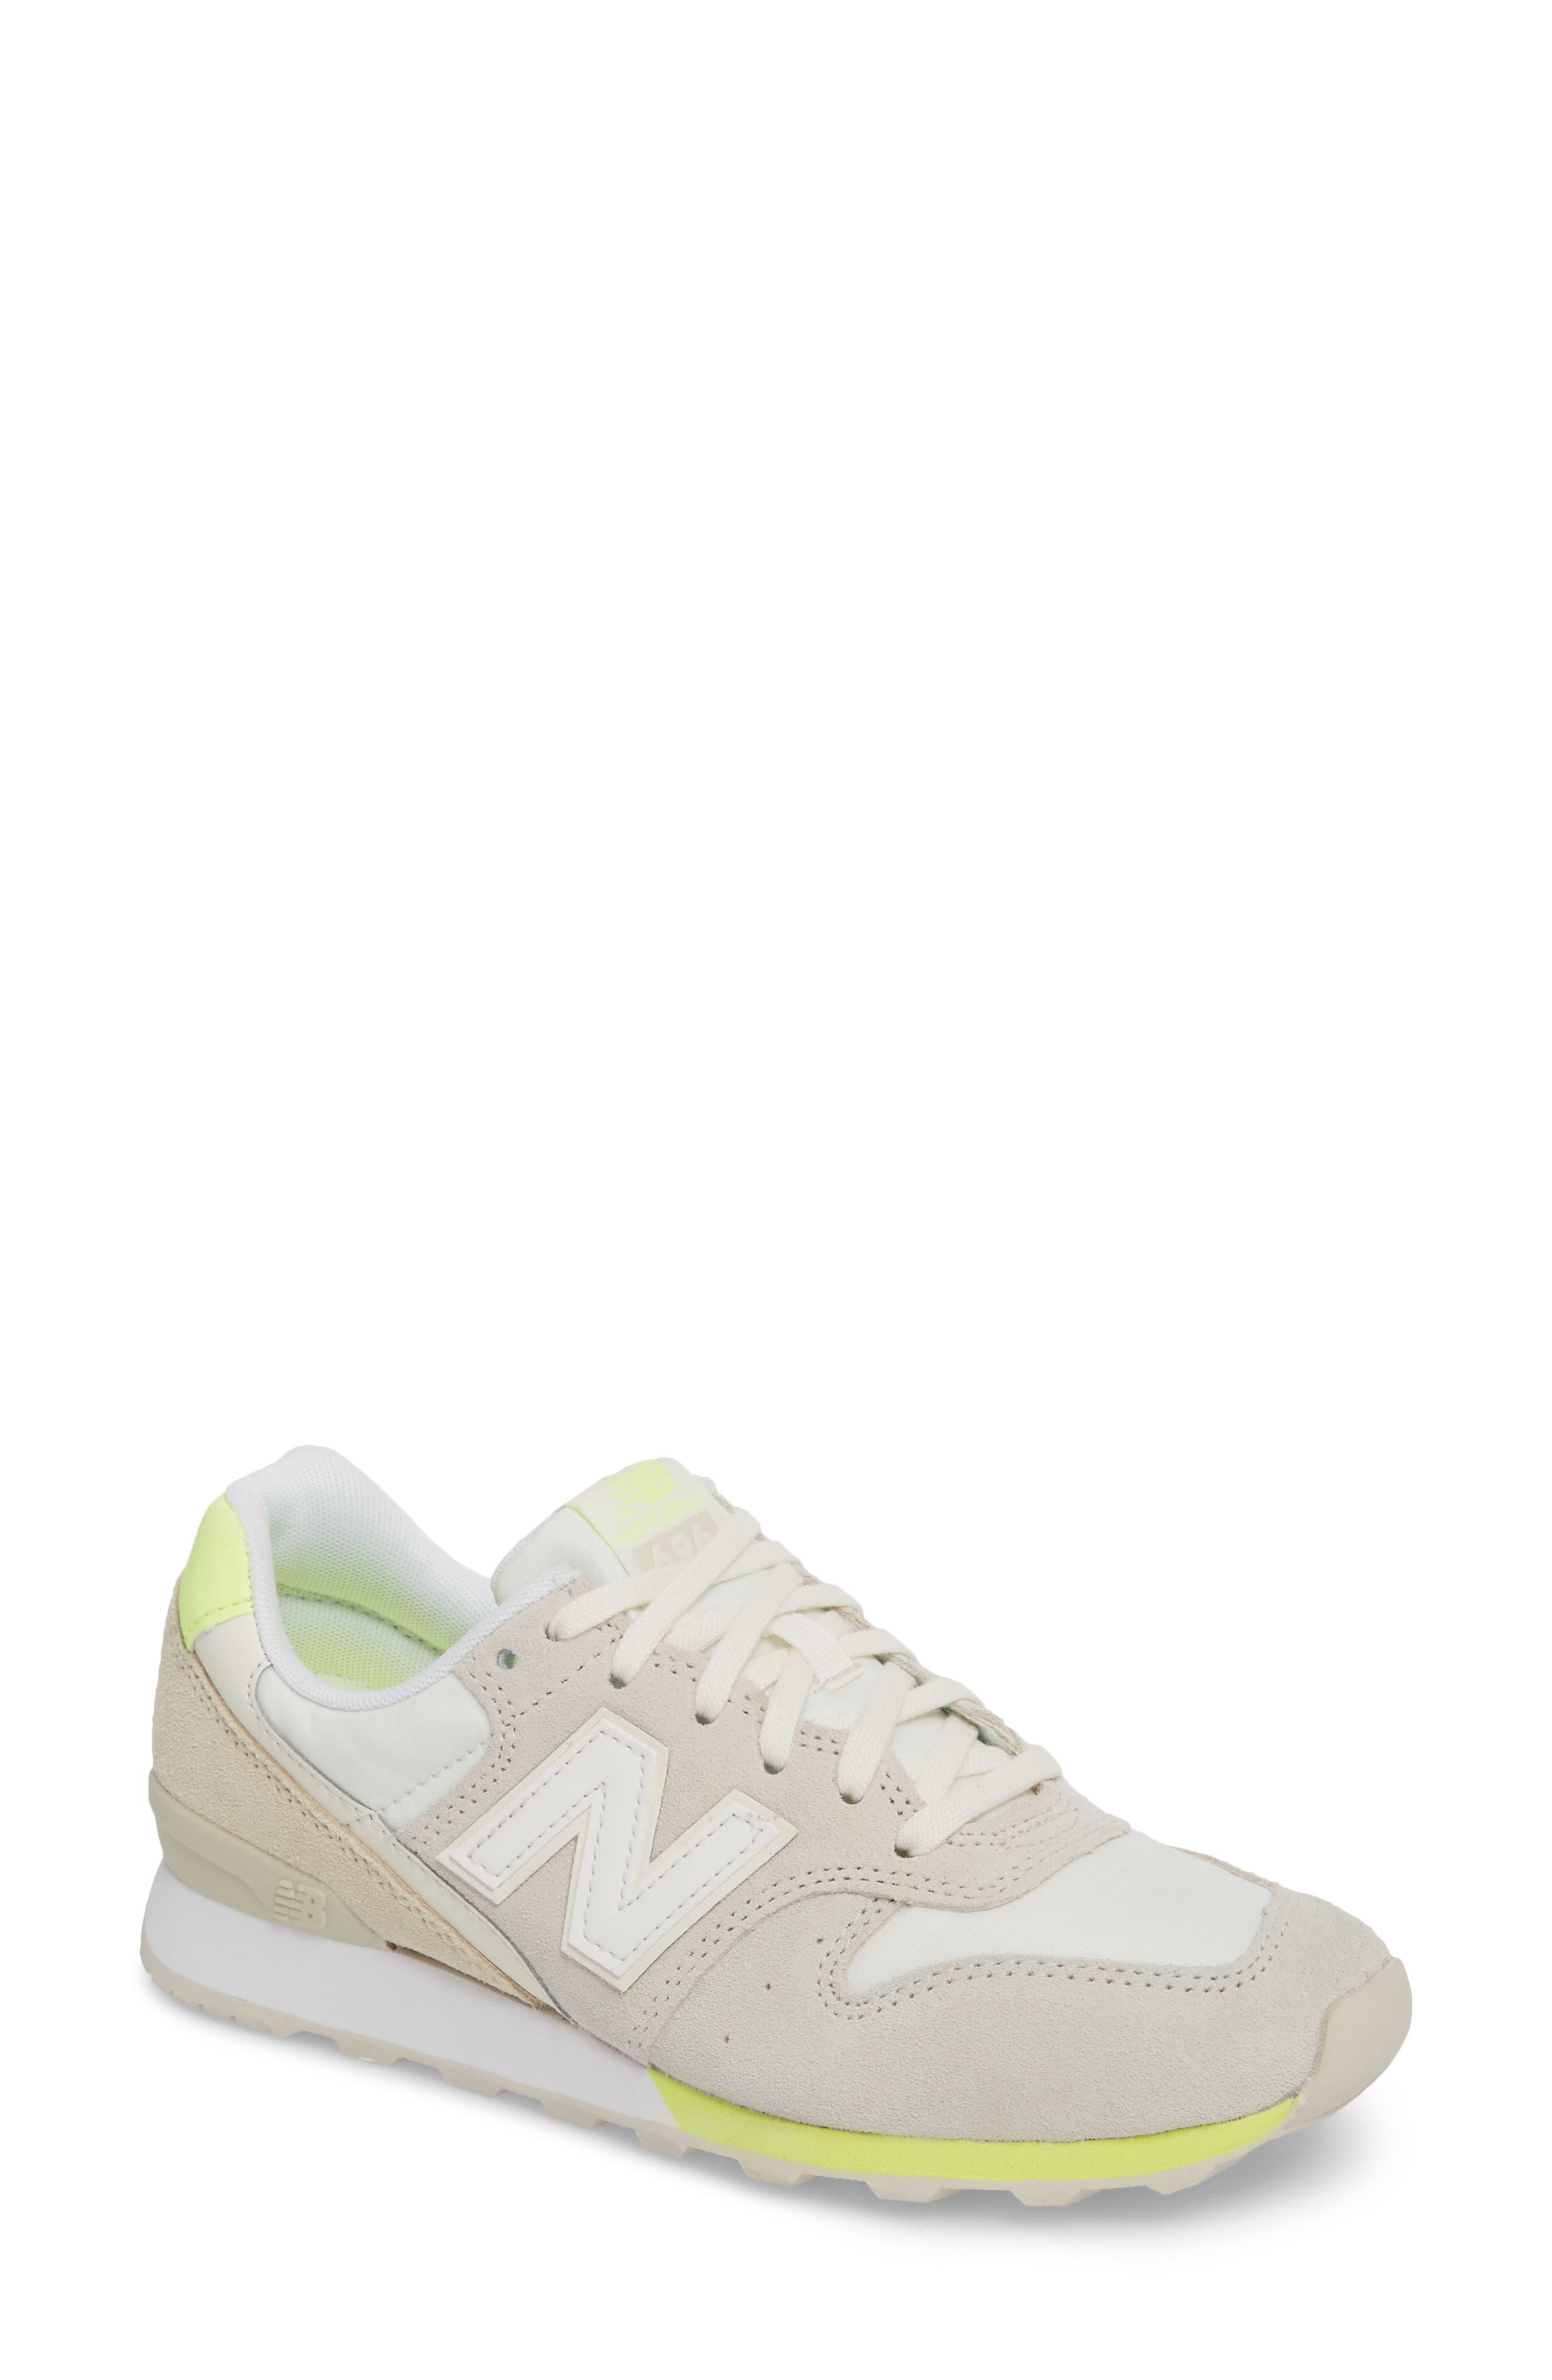 New Balance 696 Suede Sneaker (Women)